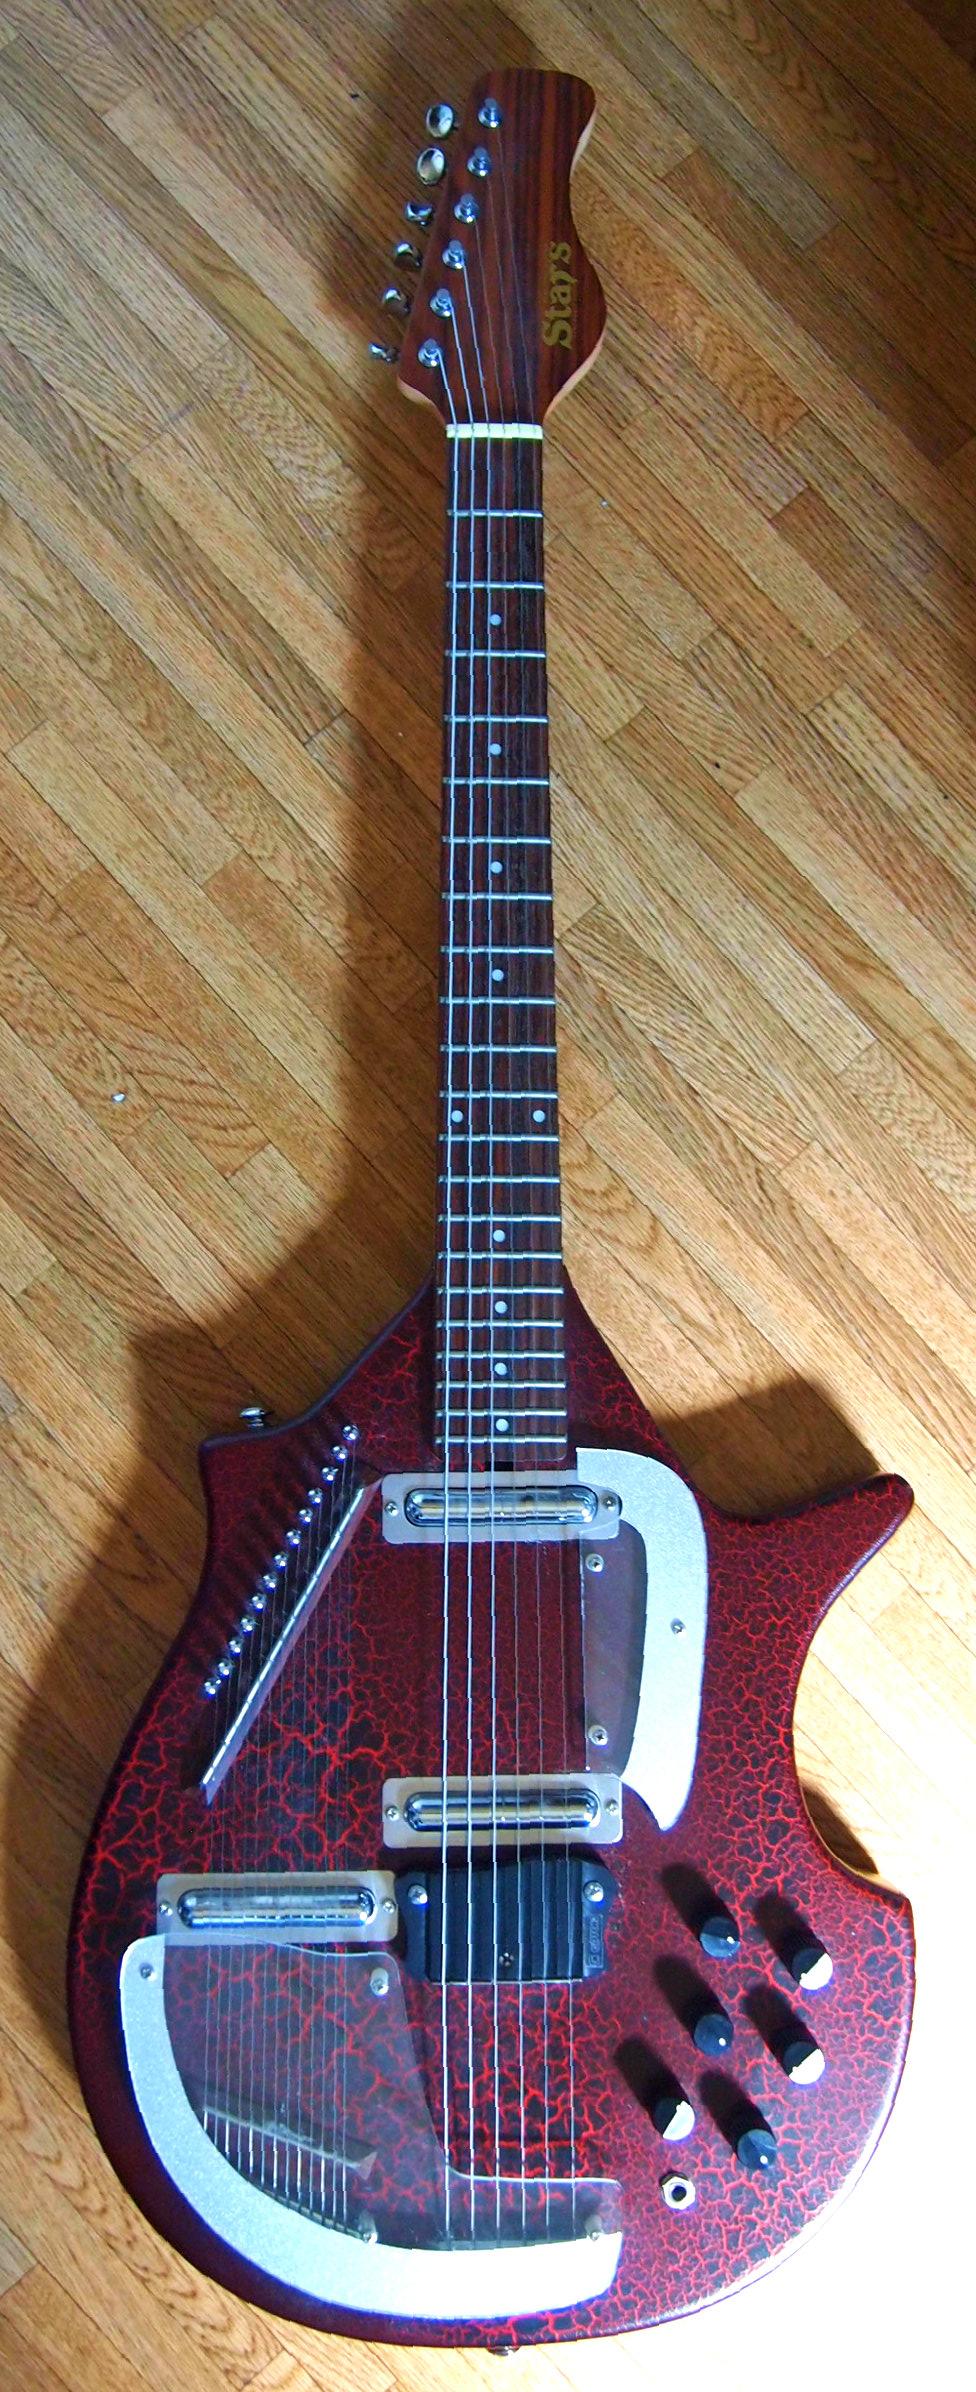 medium resolution of electric sitar wikipedia wiring diagram also typical danelectro guitars schematics on